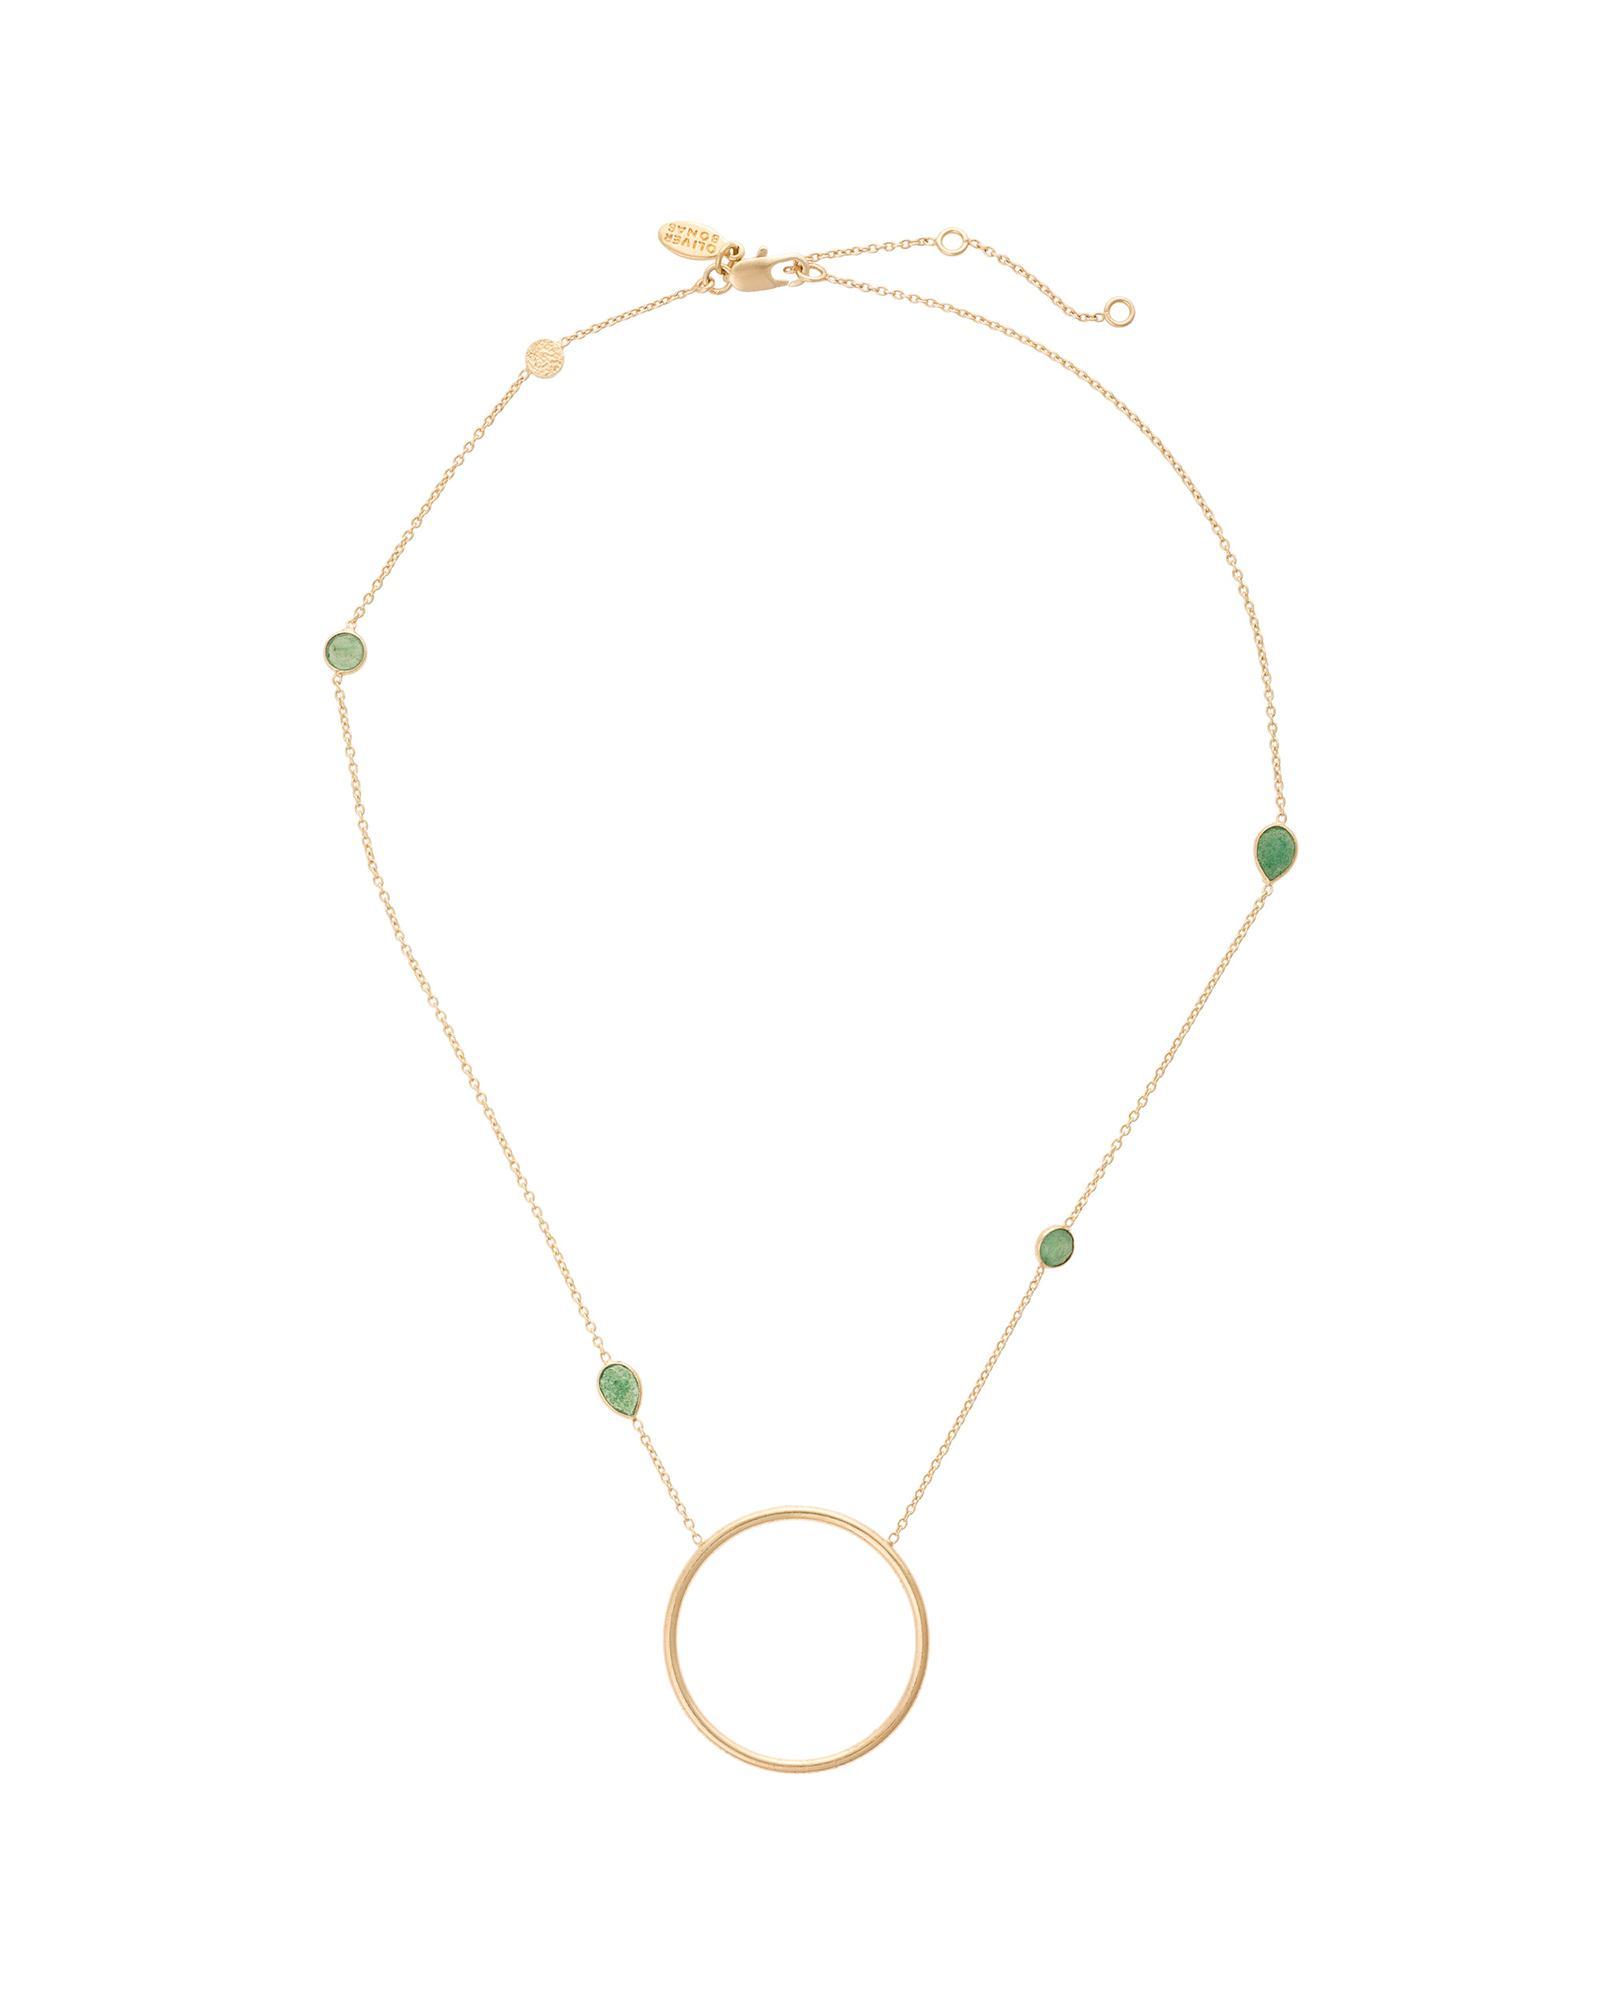 Oliver Bonas Tinde Large Circle Gold Plated Necklace in Metallic